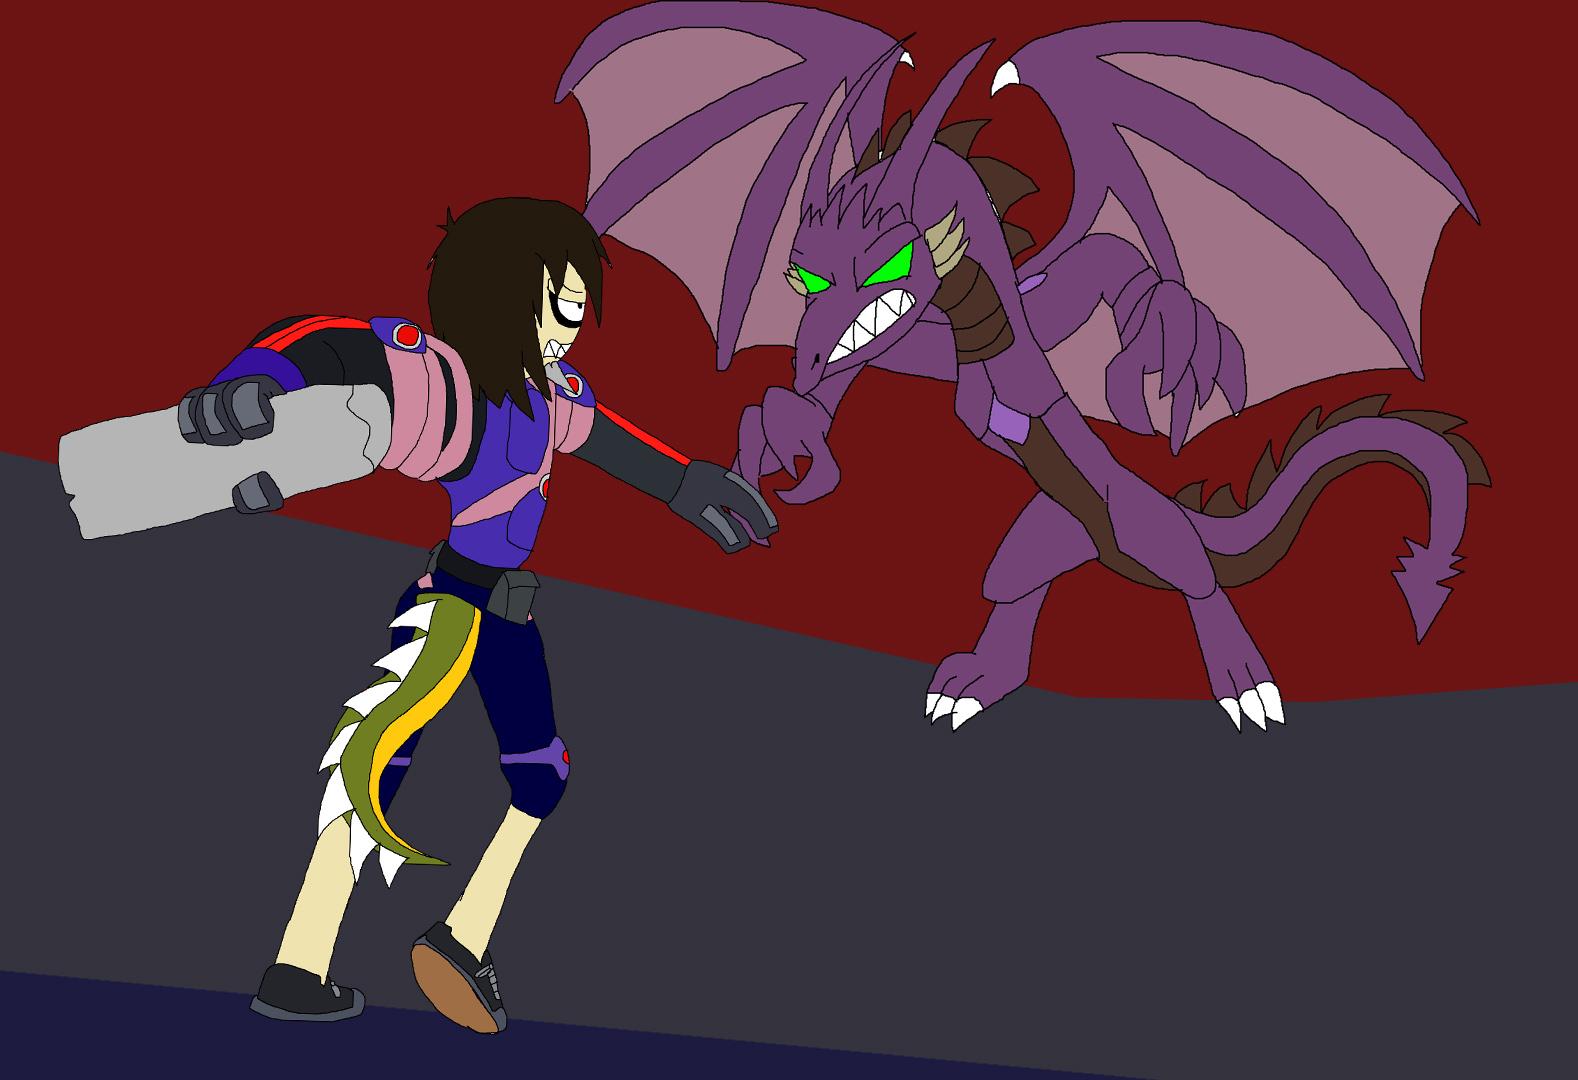 Conkeirothur vs. Frimalako by Rainbow-Dash-Rockz